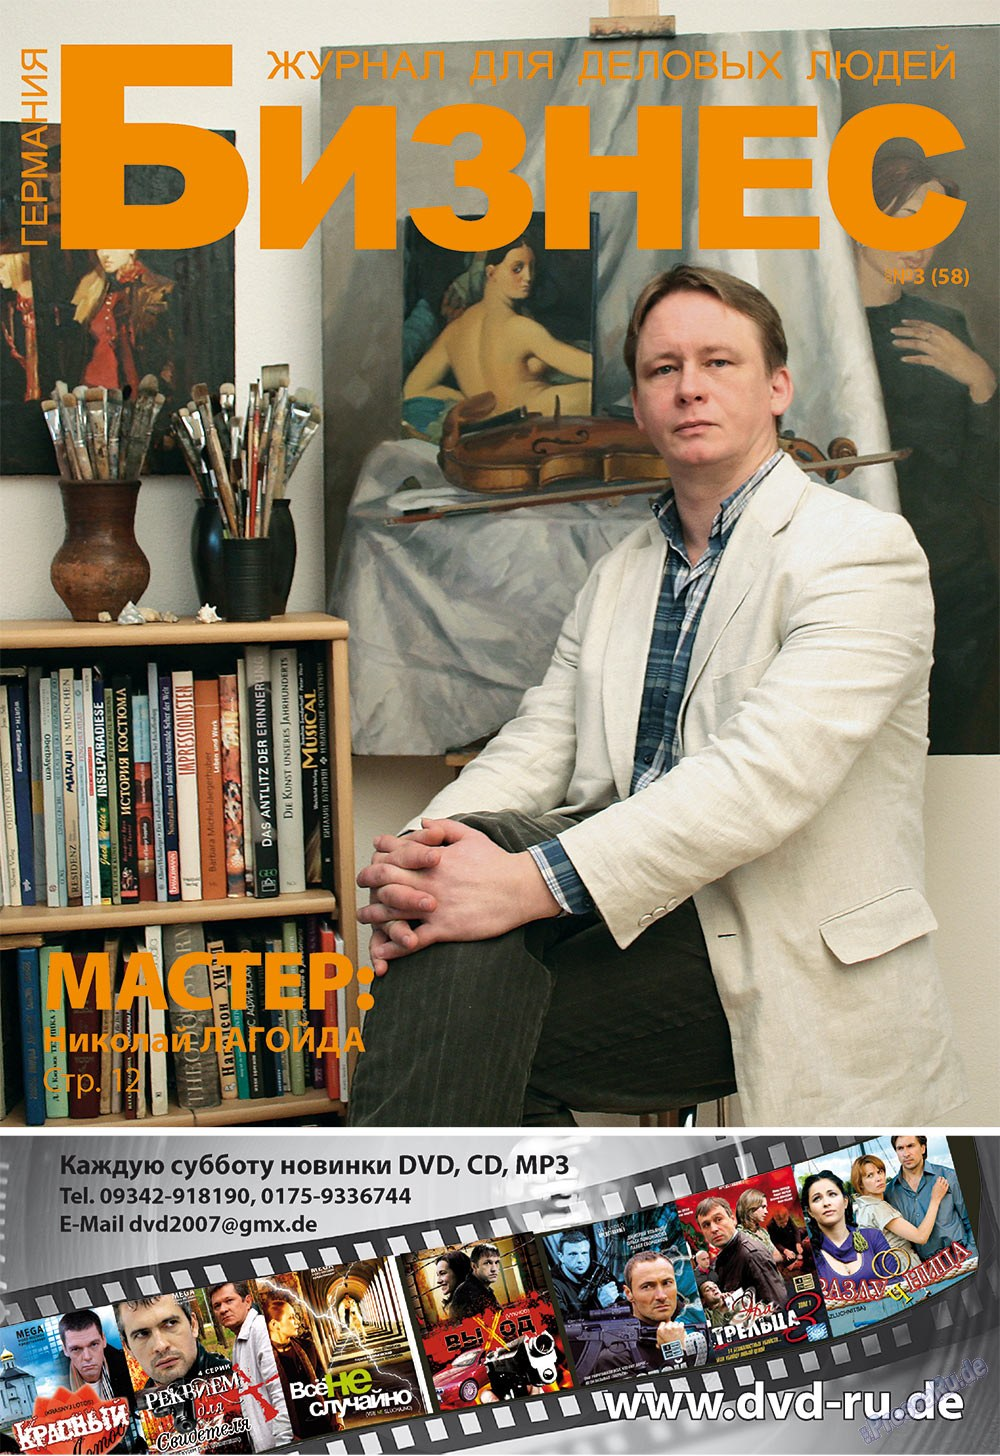 Бизнес (журнал). 2009 год, номер 3, стр. 1